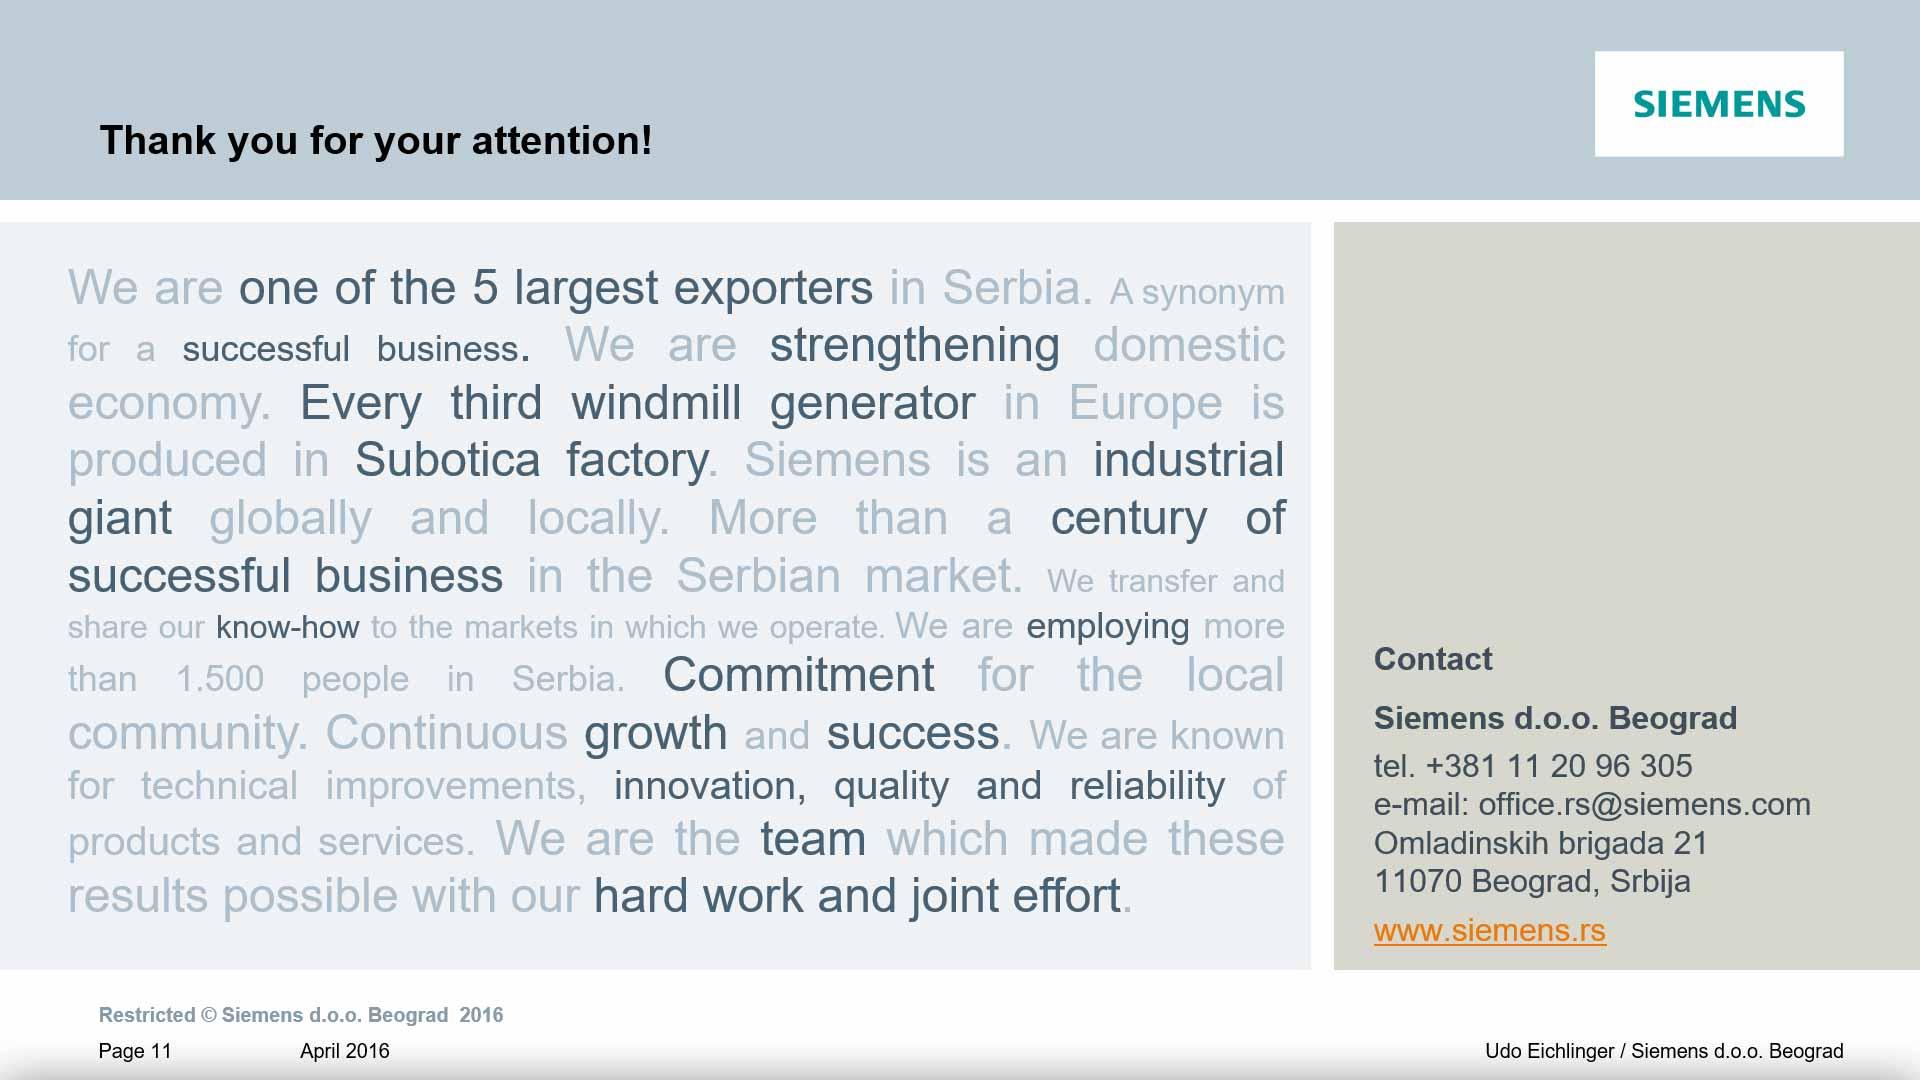 Siemens Presentation - Bane Krstonosic